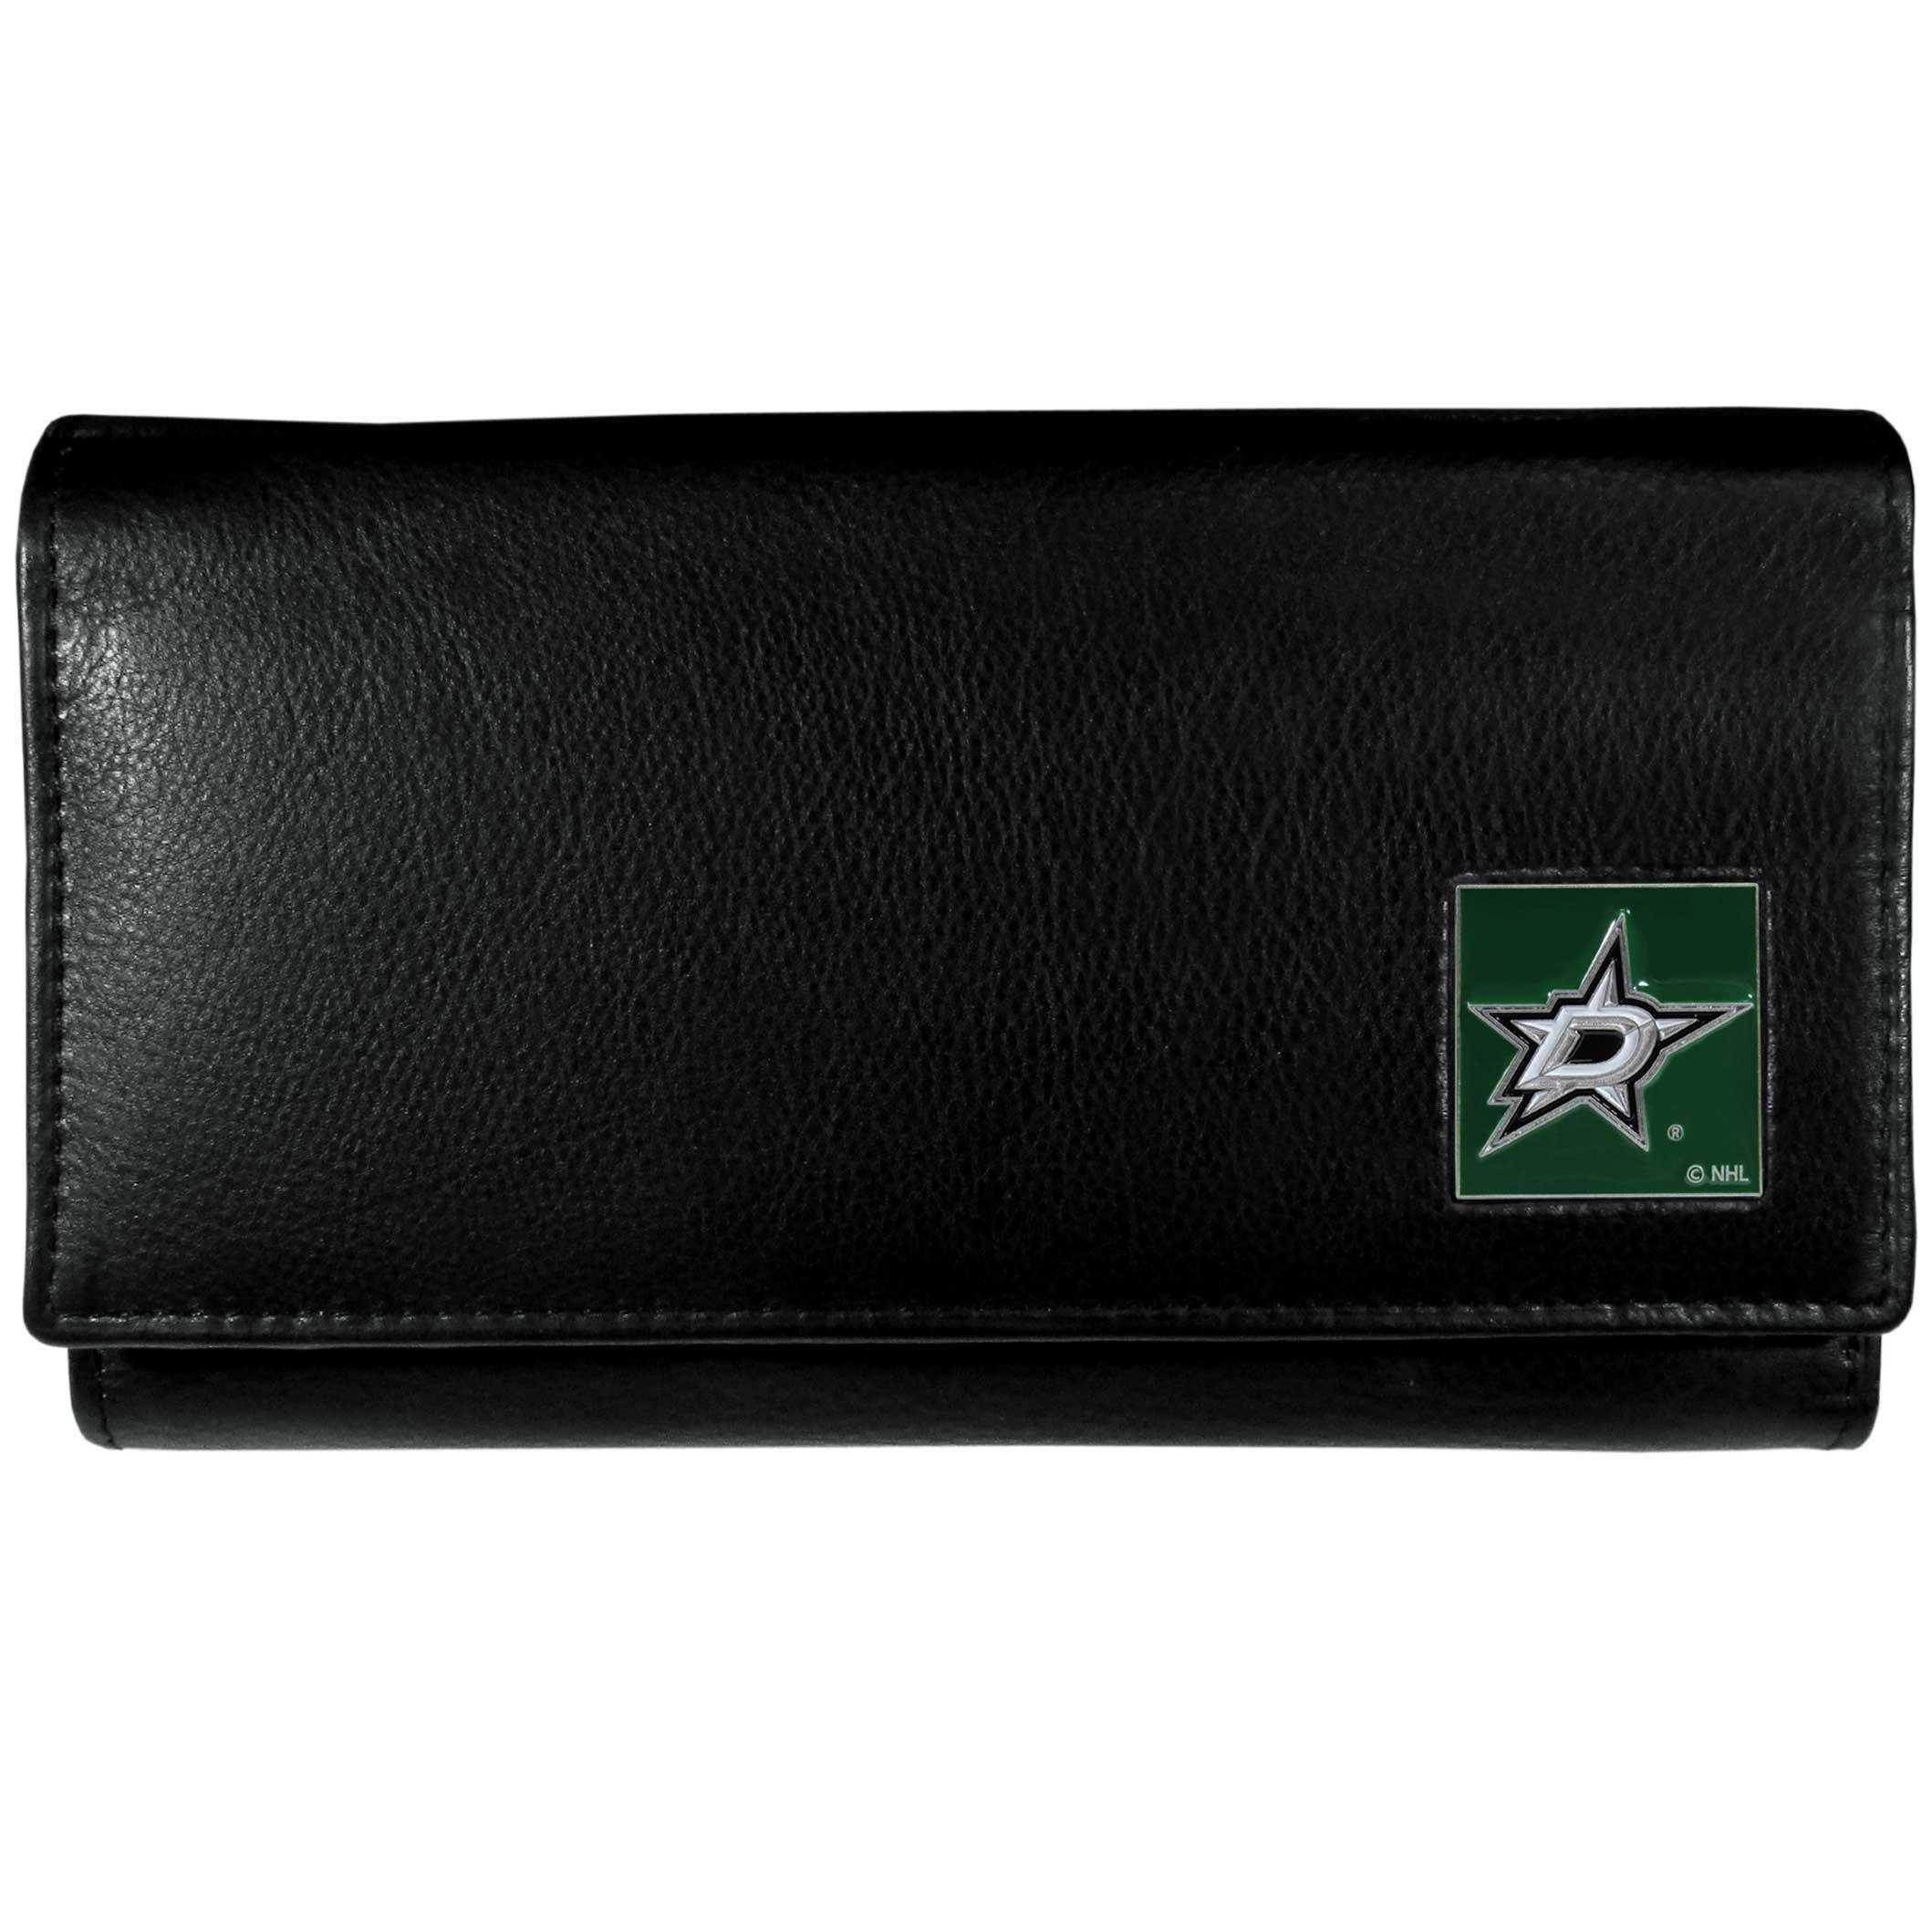 NHL Dallas Stars Genuine Leather Women's Wallet